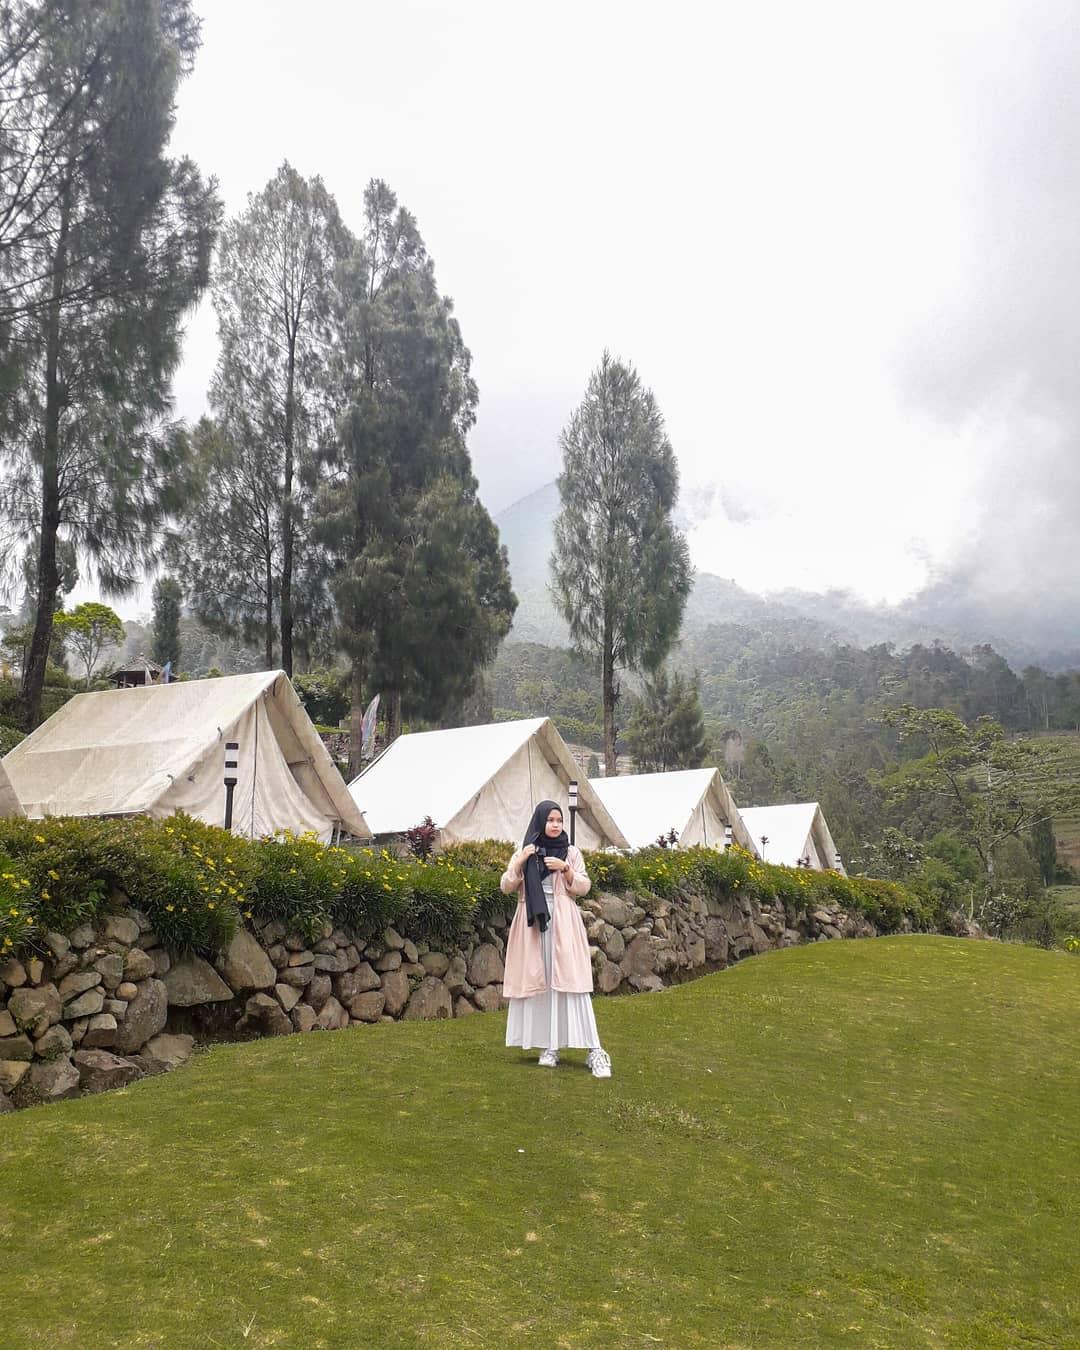 Camping Wisata Alam Posong